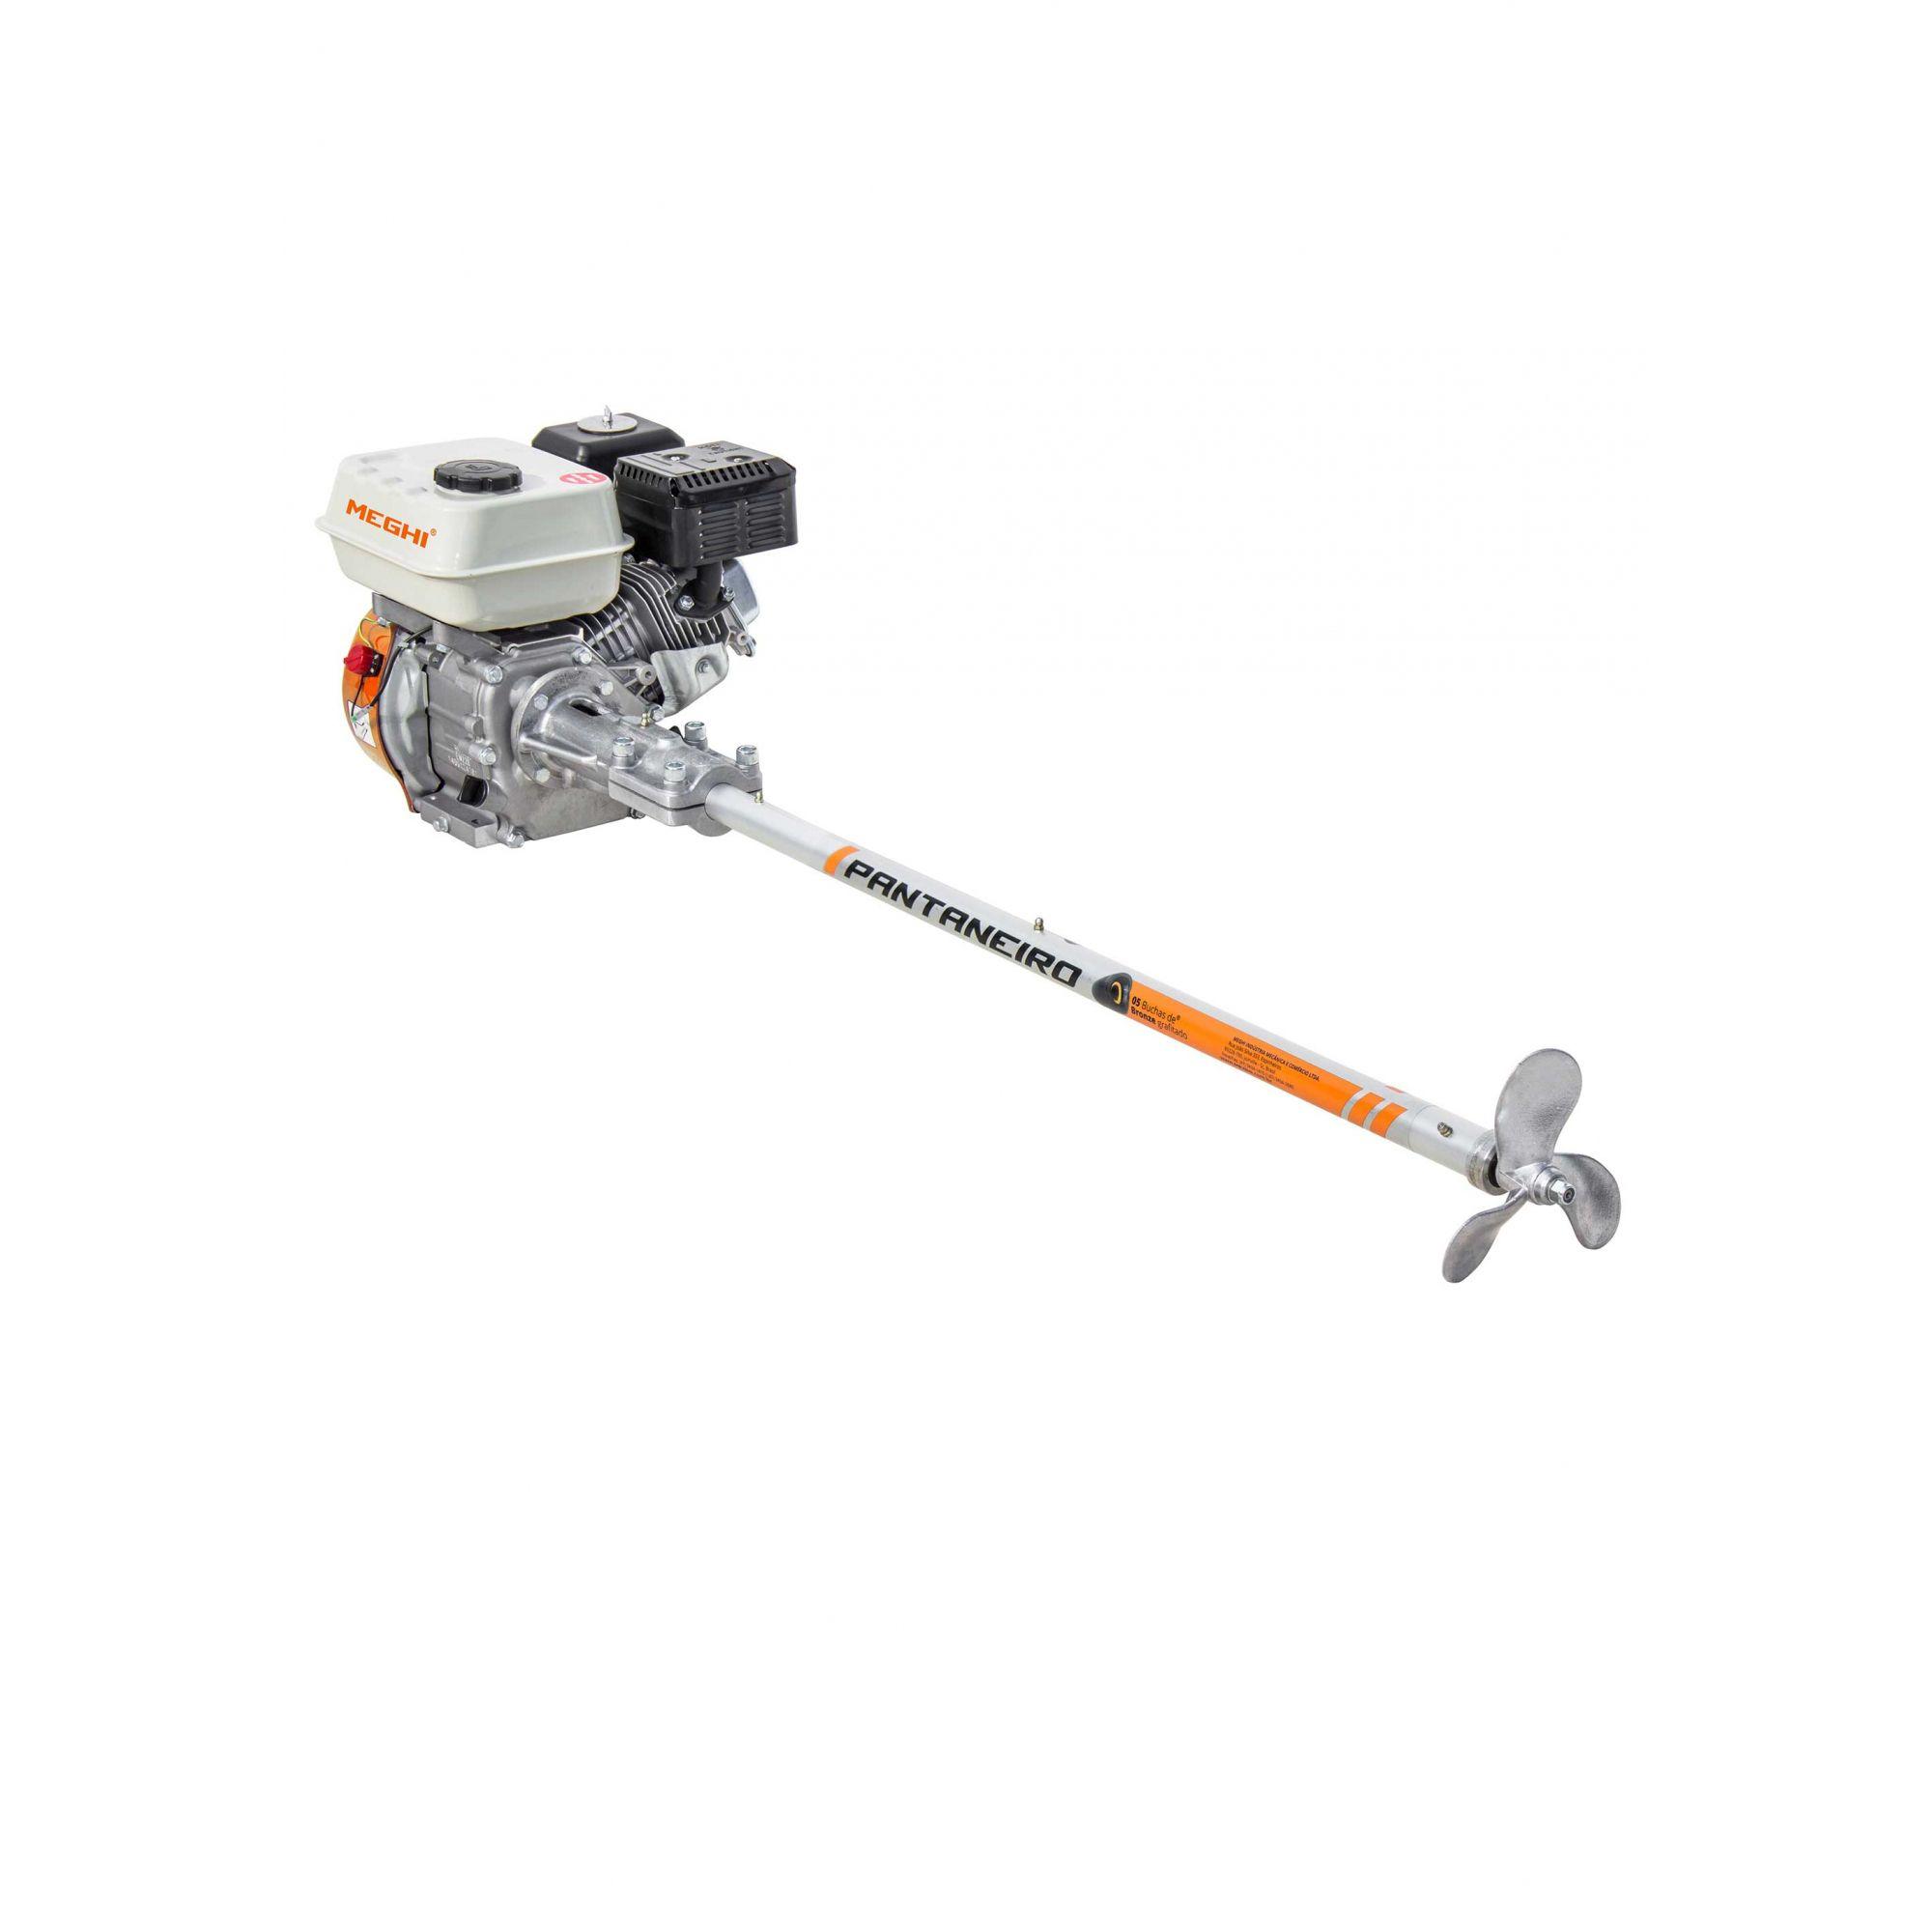 Kit Motor De Centro Barco Bote 1,20mt P/ Motor 5,5/6,5/7,0hp